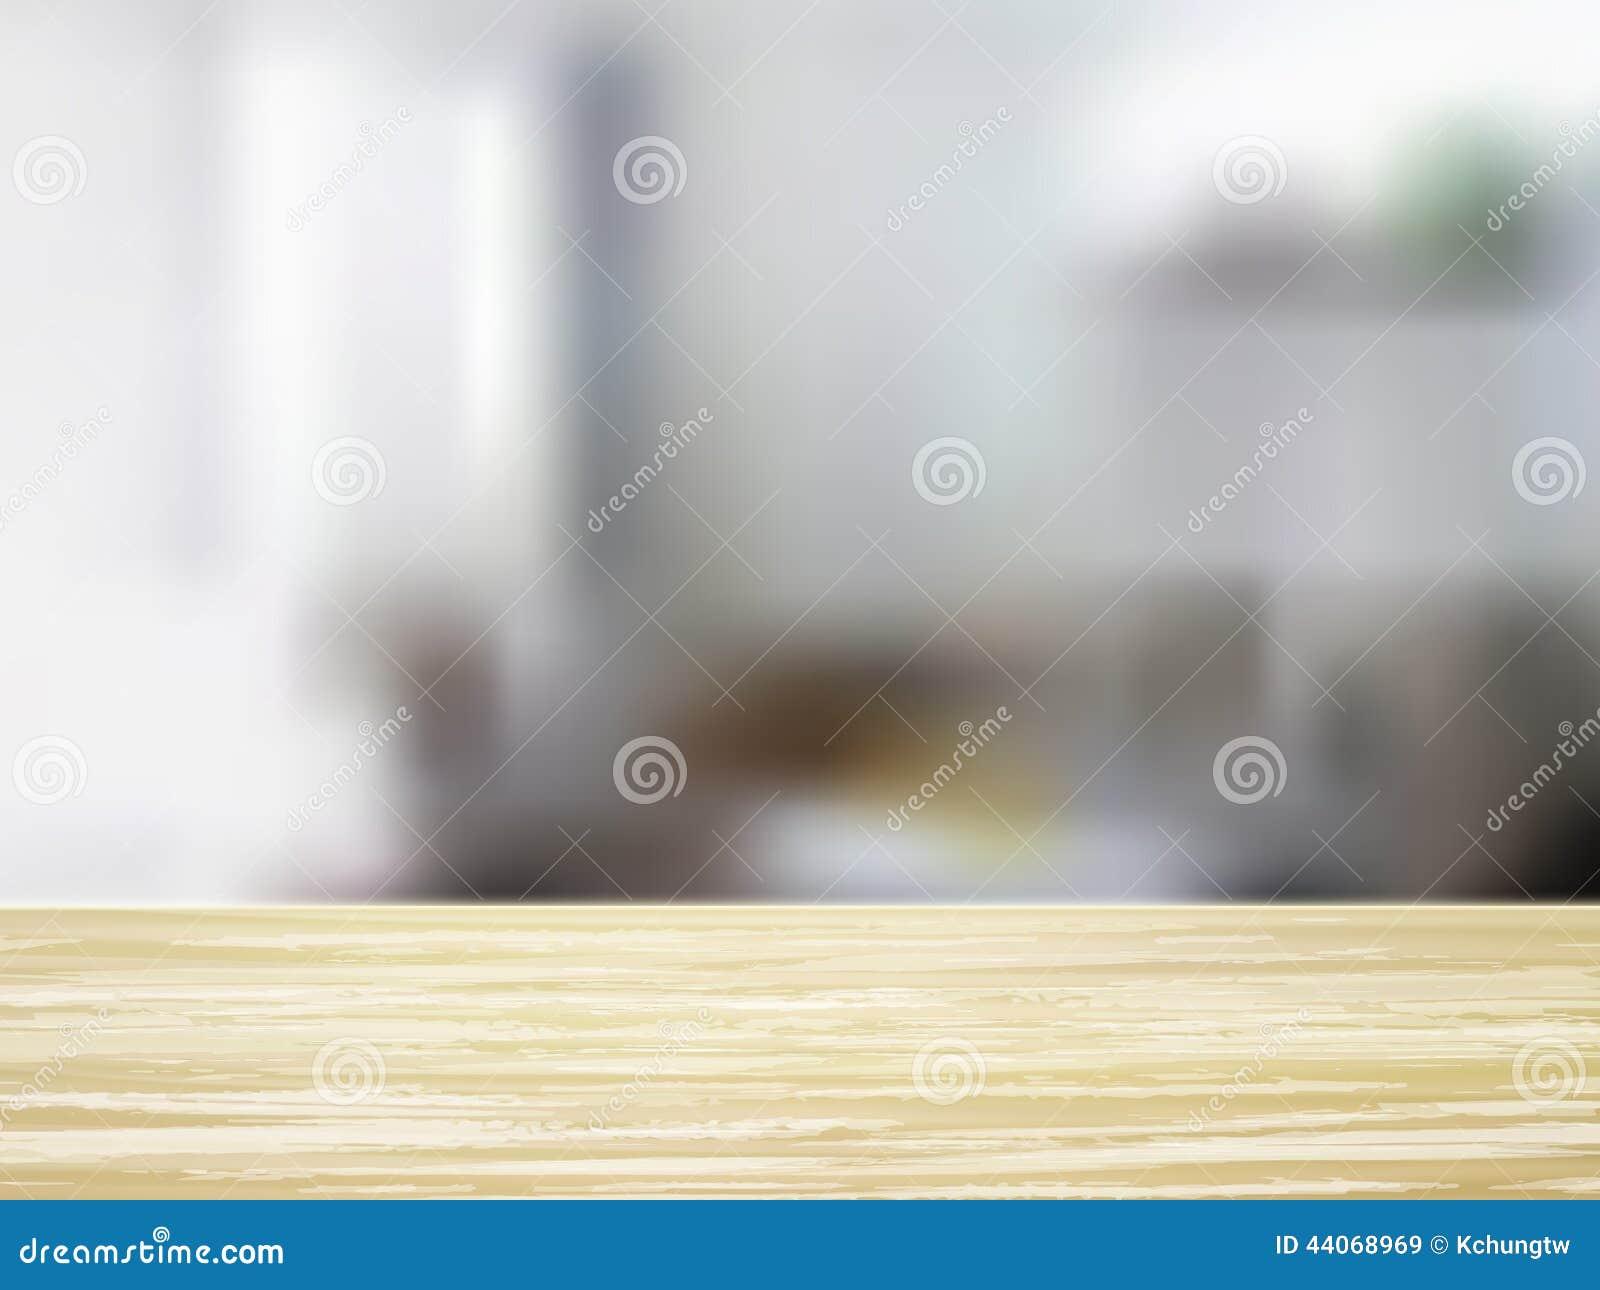 Interior wooden shelves free vector - Closeup Of Wooden Desk And Interior Stock Vector